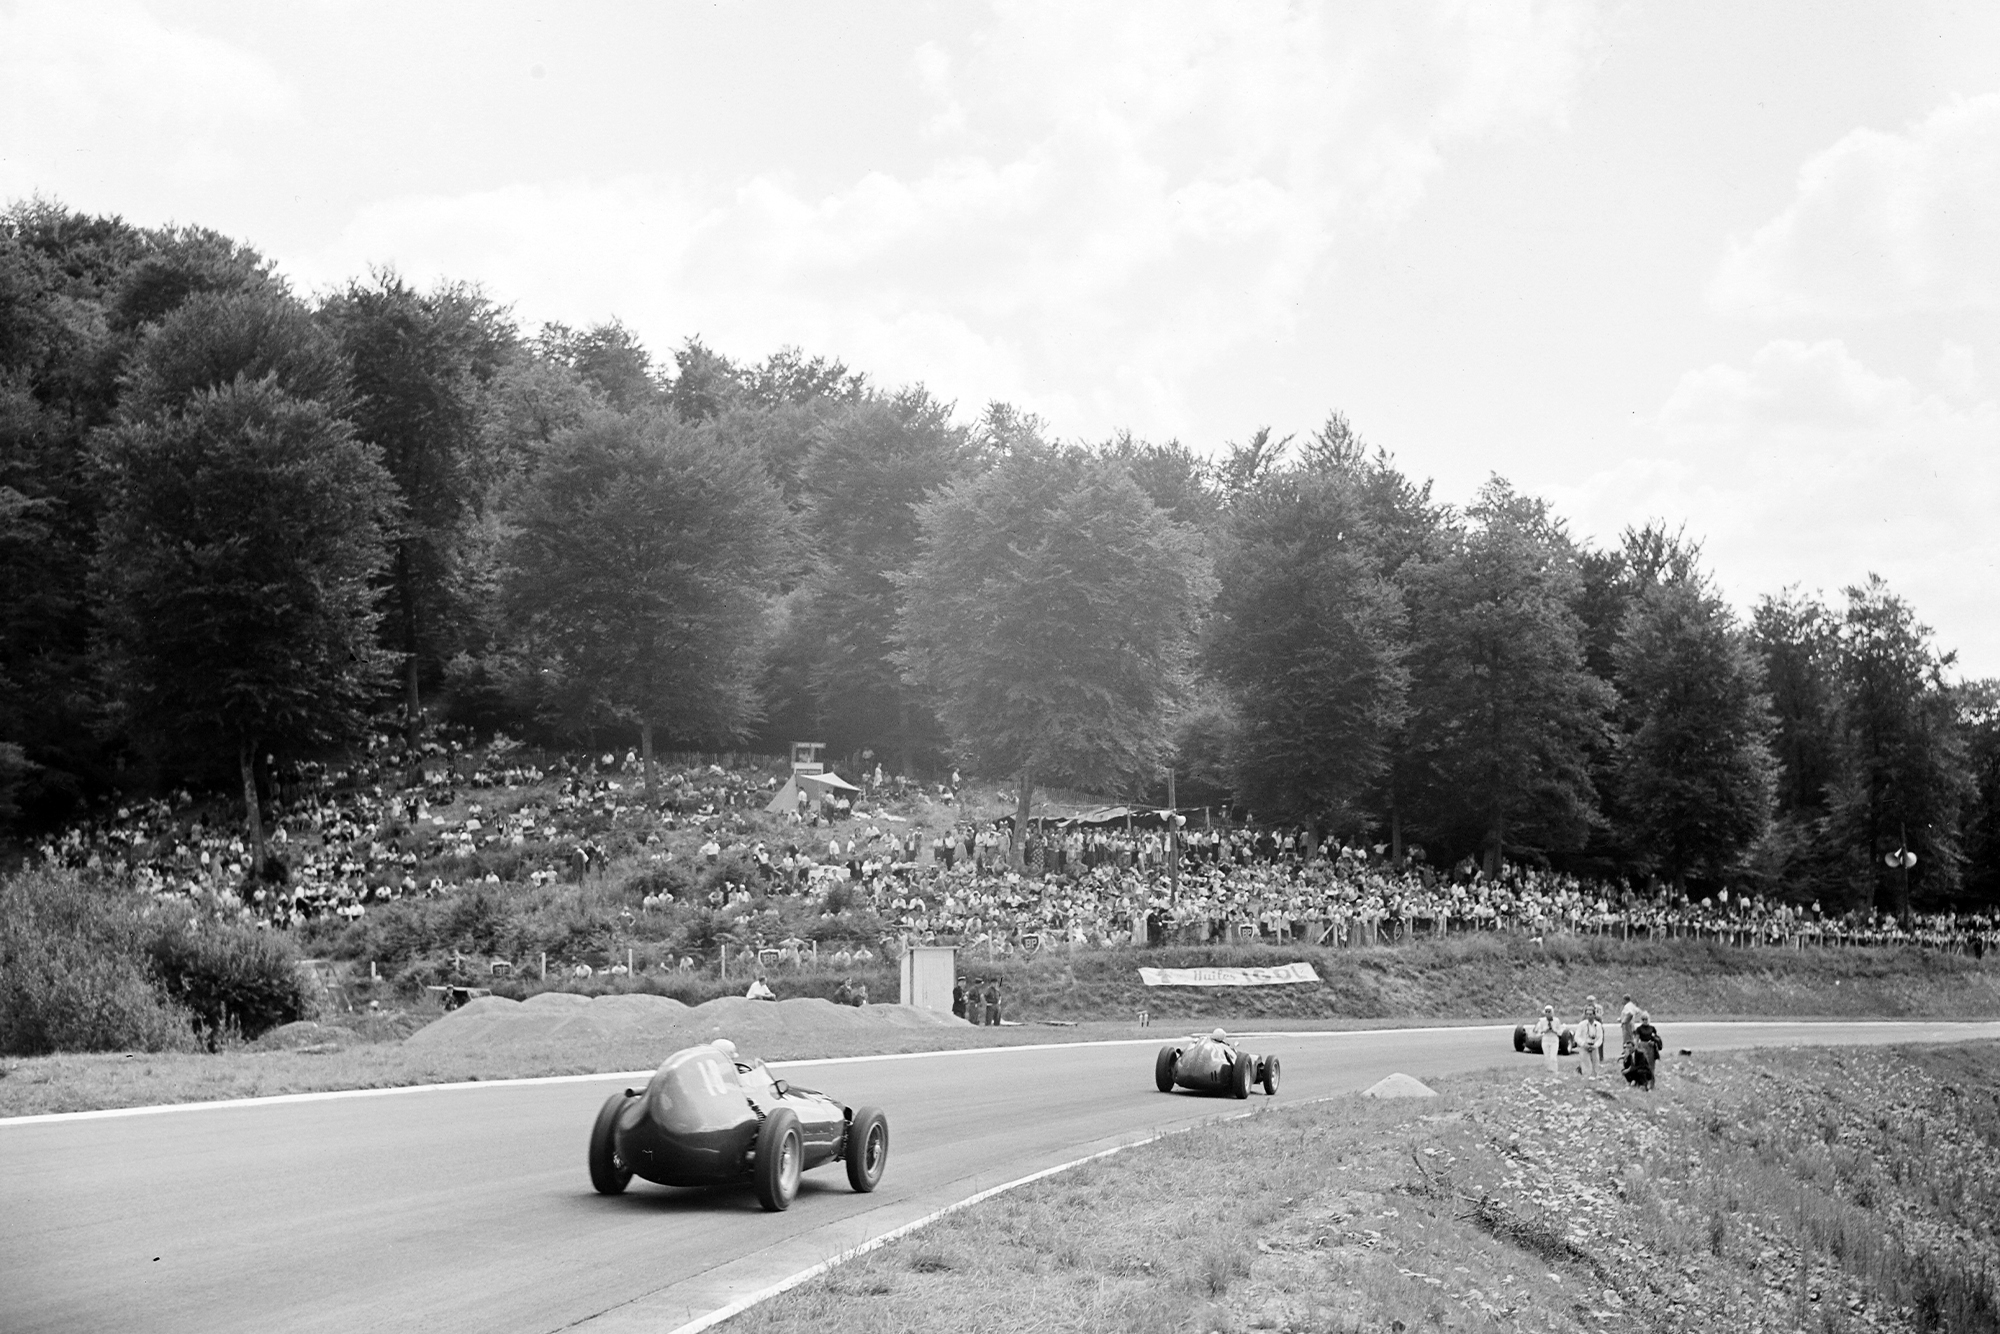 Herbert MacKay-Fraser, BRM P25, leads Stuart Lewis-Evans, Vanwall, 1957 French Grand Prix, Rouen.